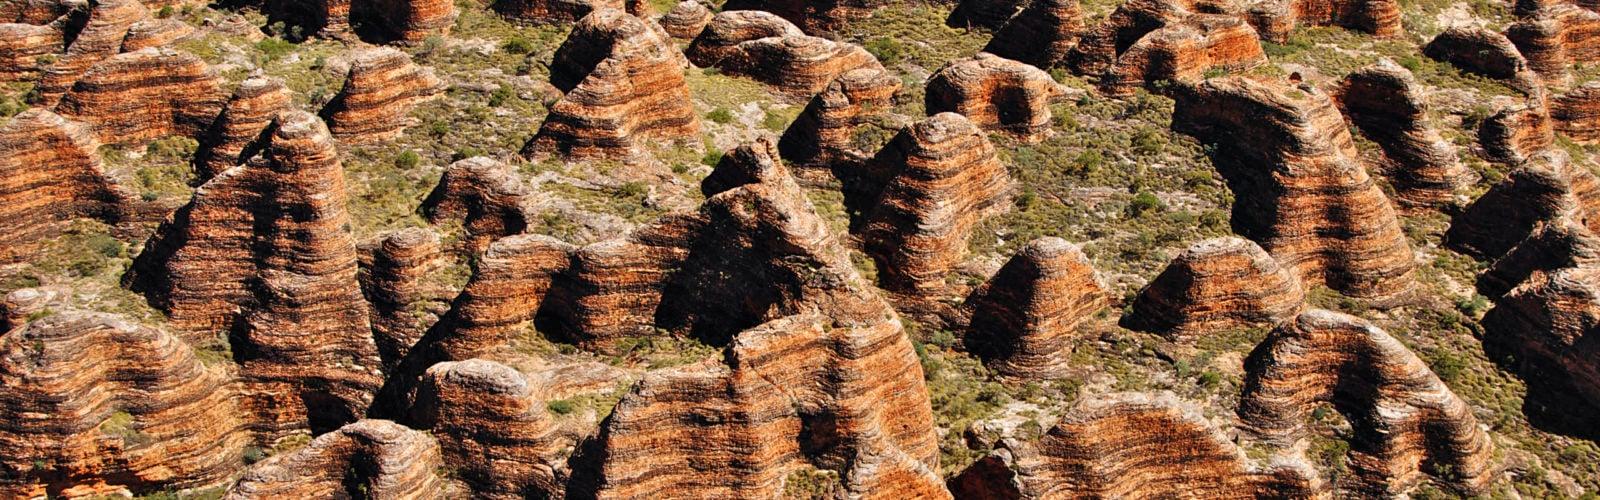 rock-formations-bungle-bungle-national-park-australia